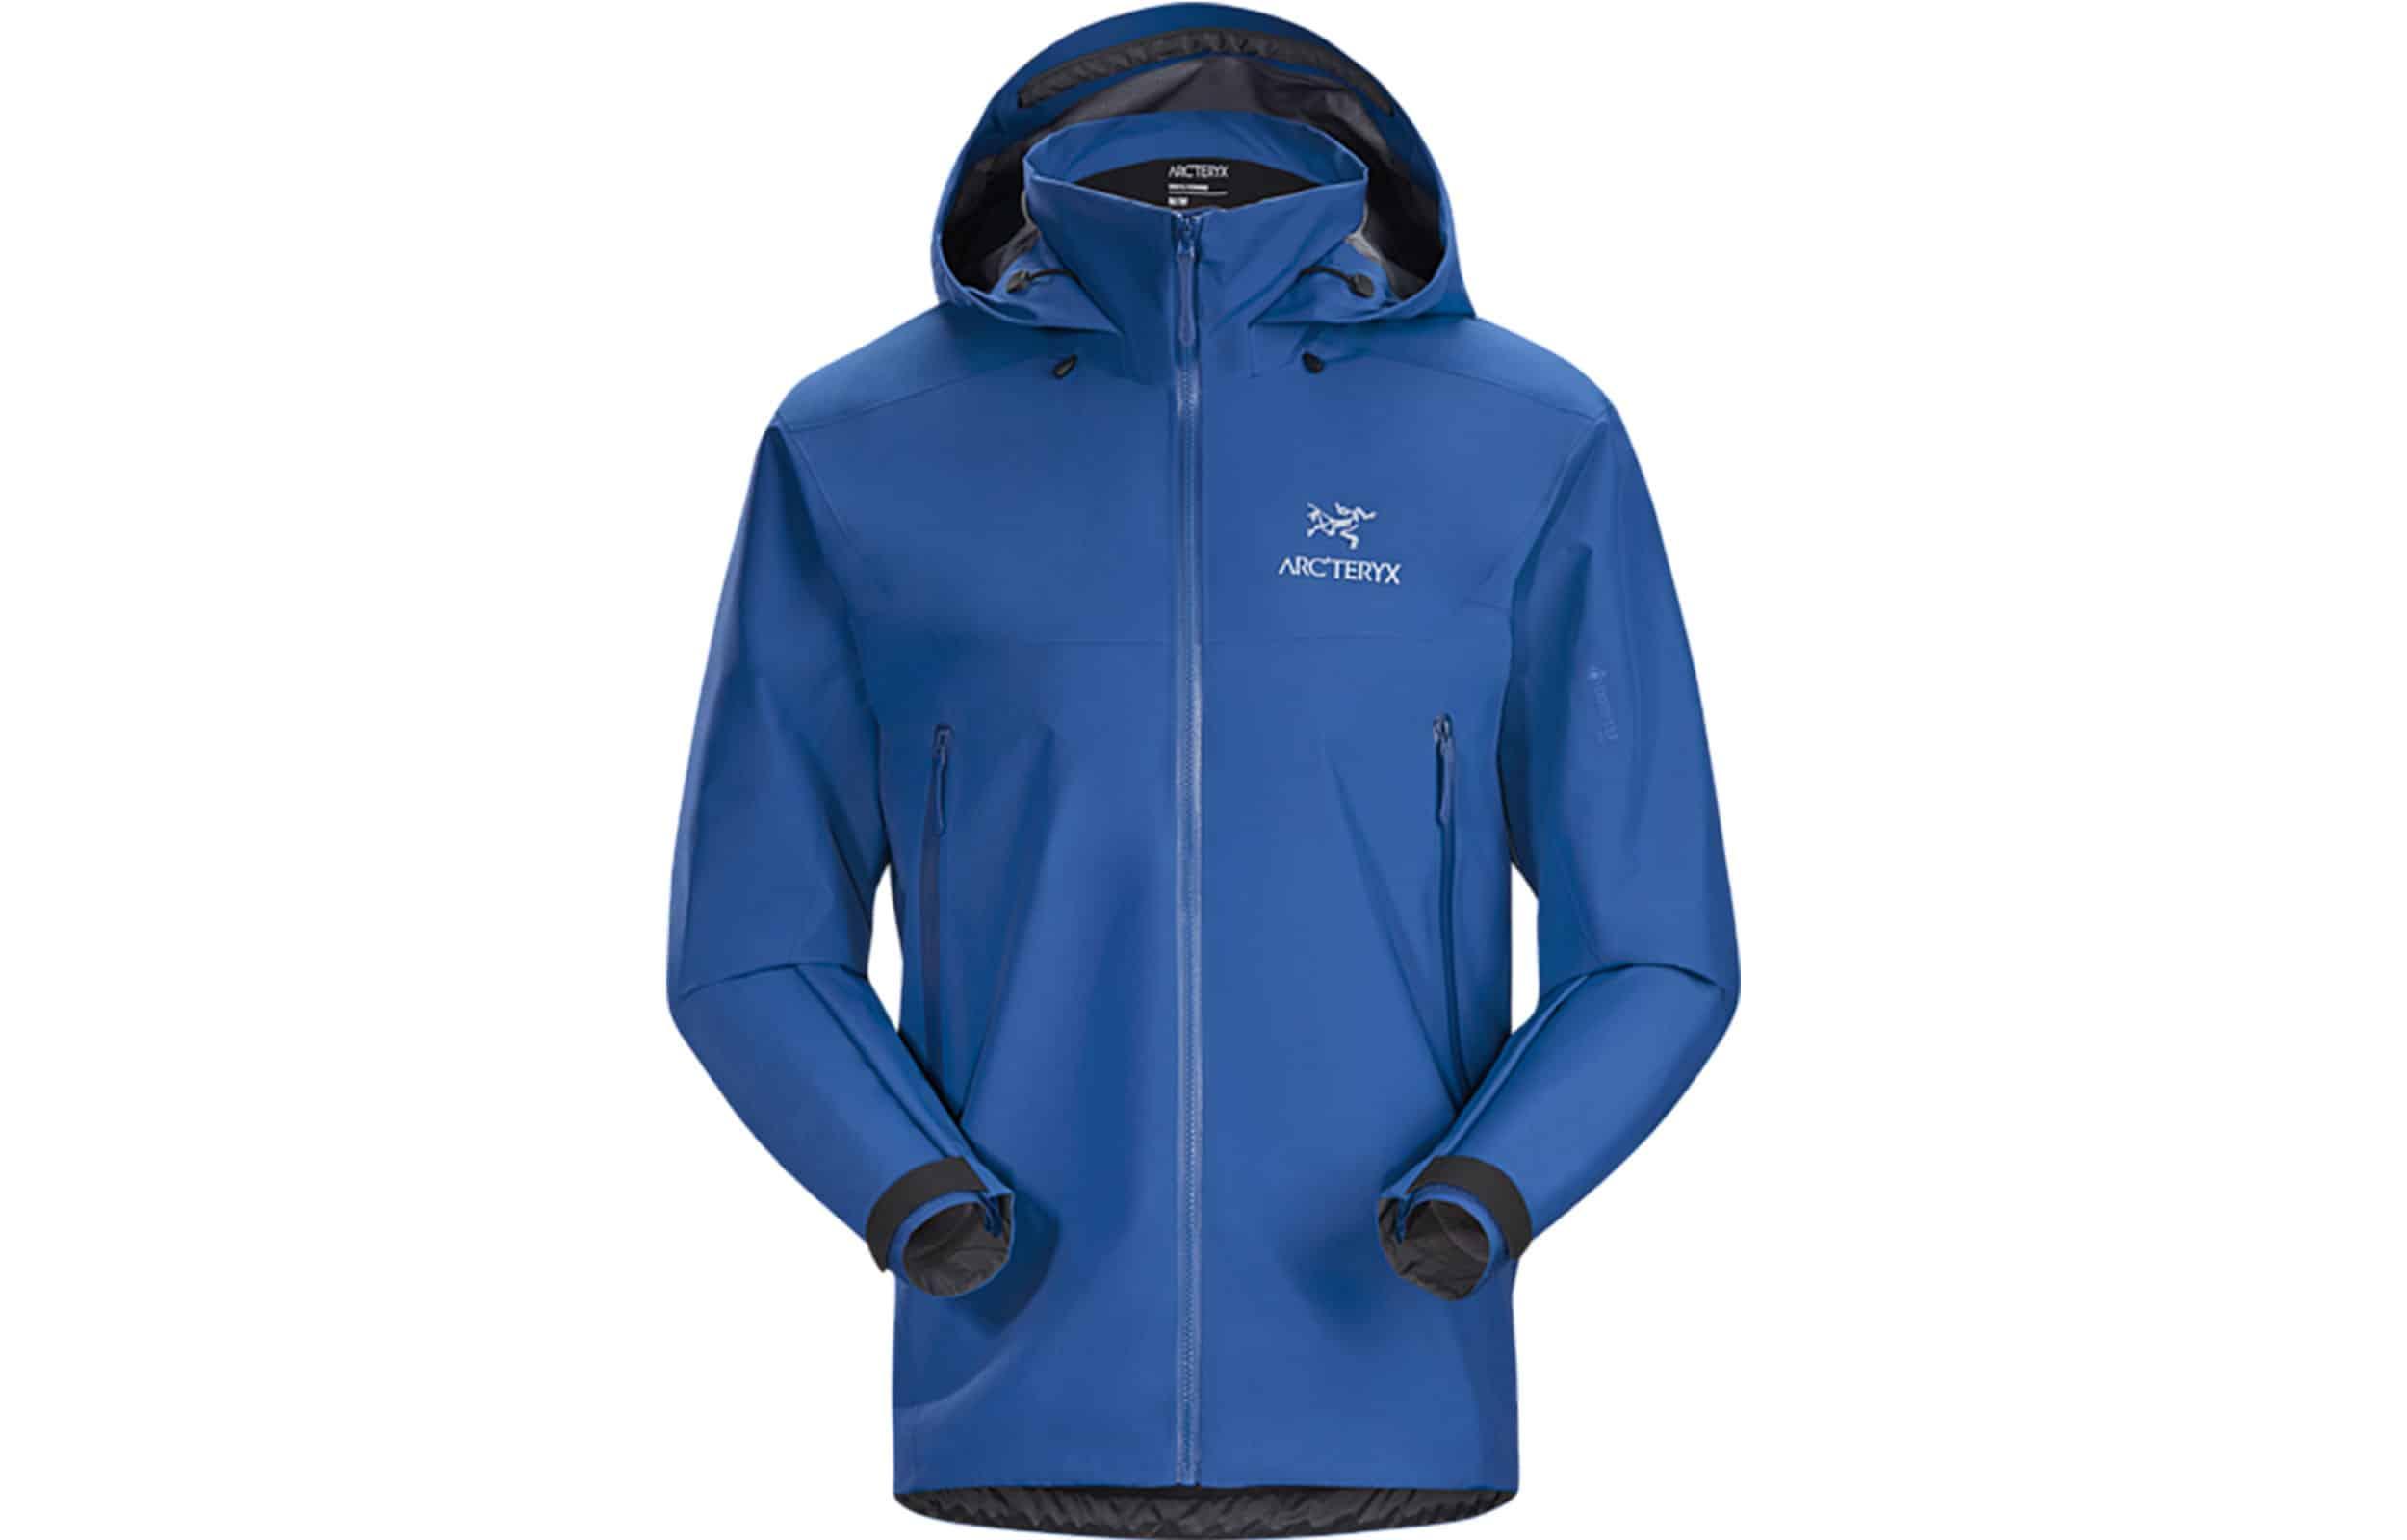 Arc'teryx Beta AR Jacket in colbalt blue